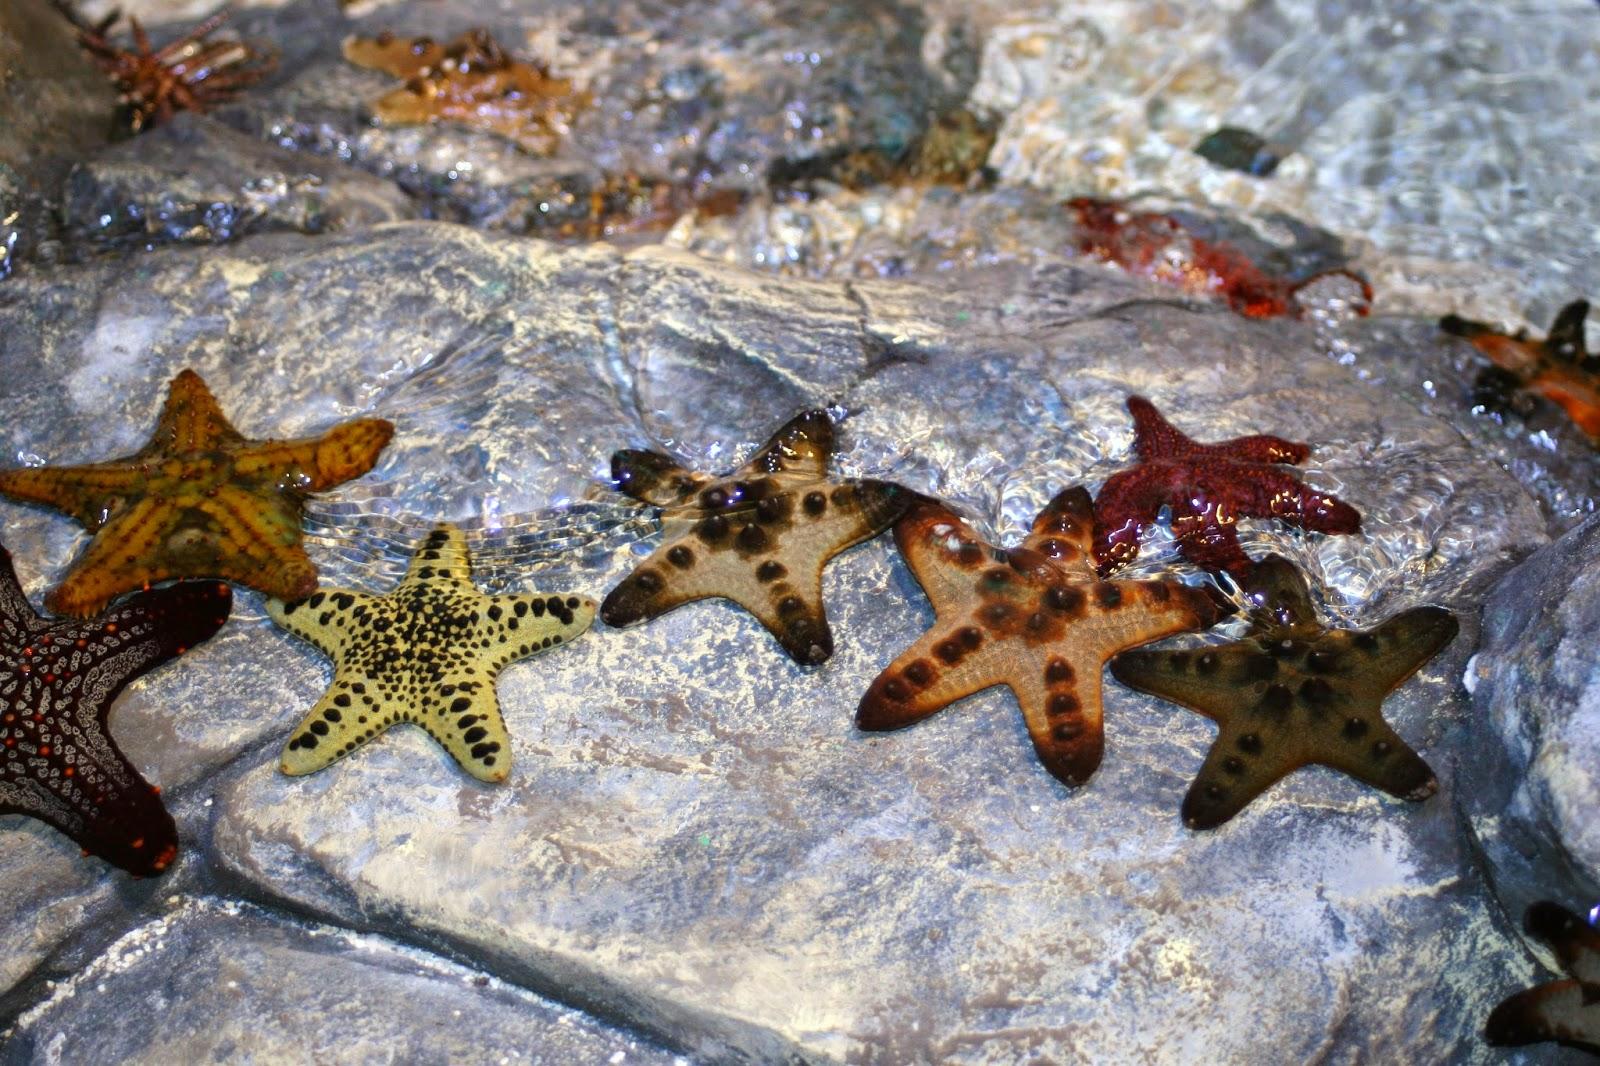 Sea Life, Aquarium, Great Lake Crossing, Michigan, Grand Opening, Sea,